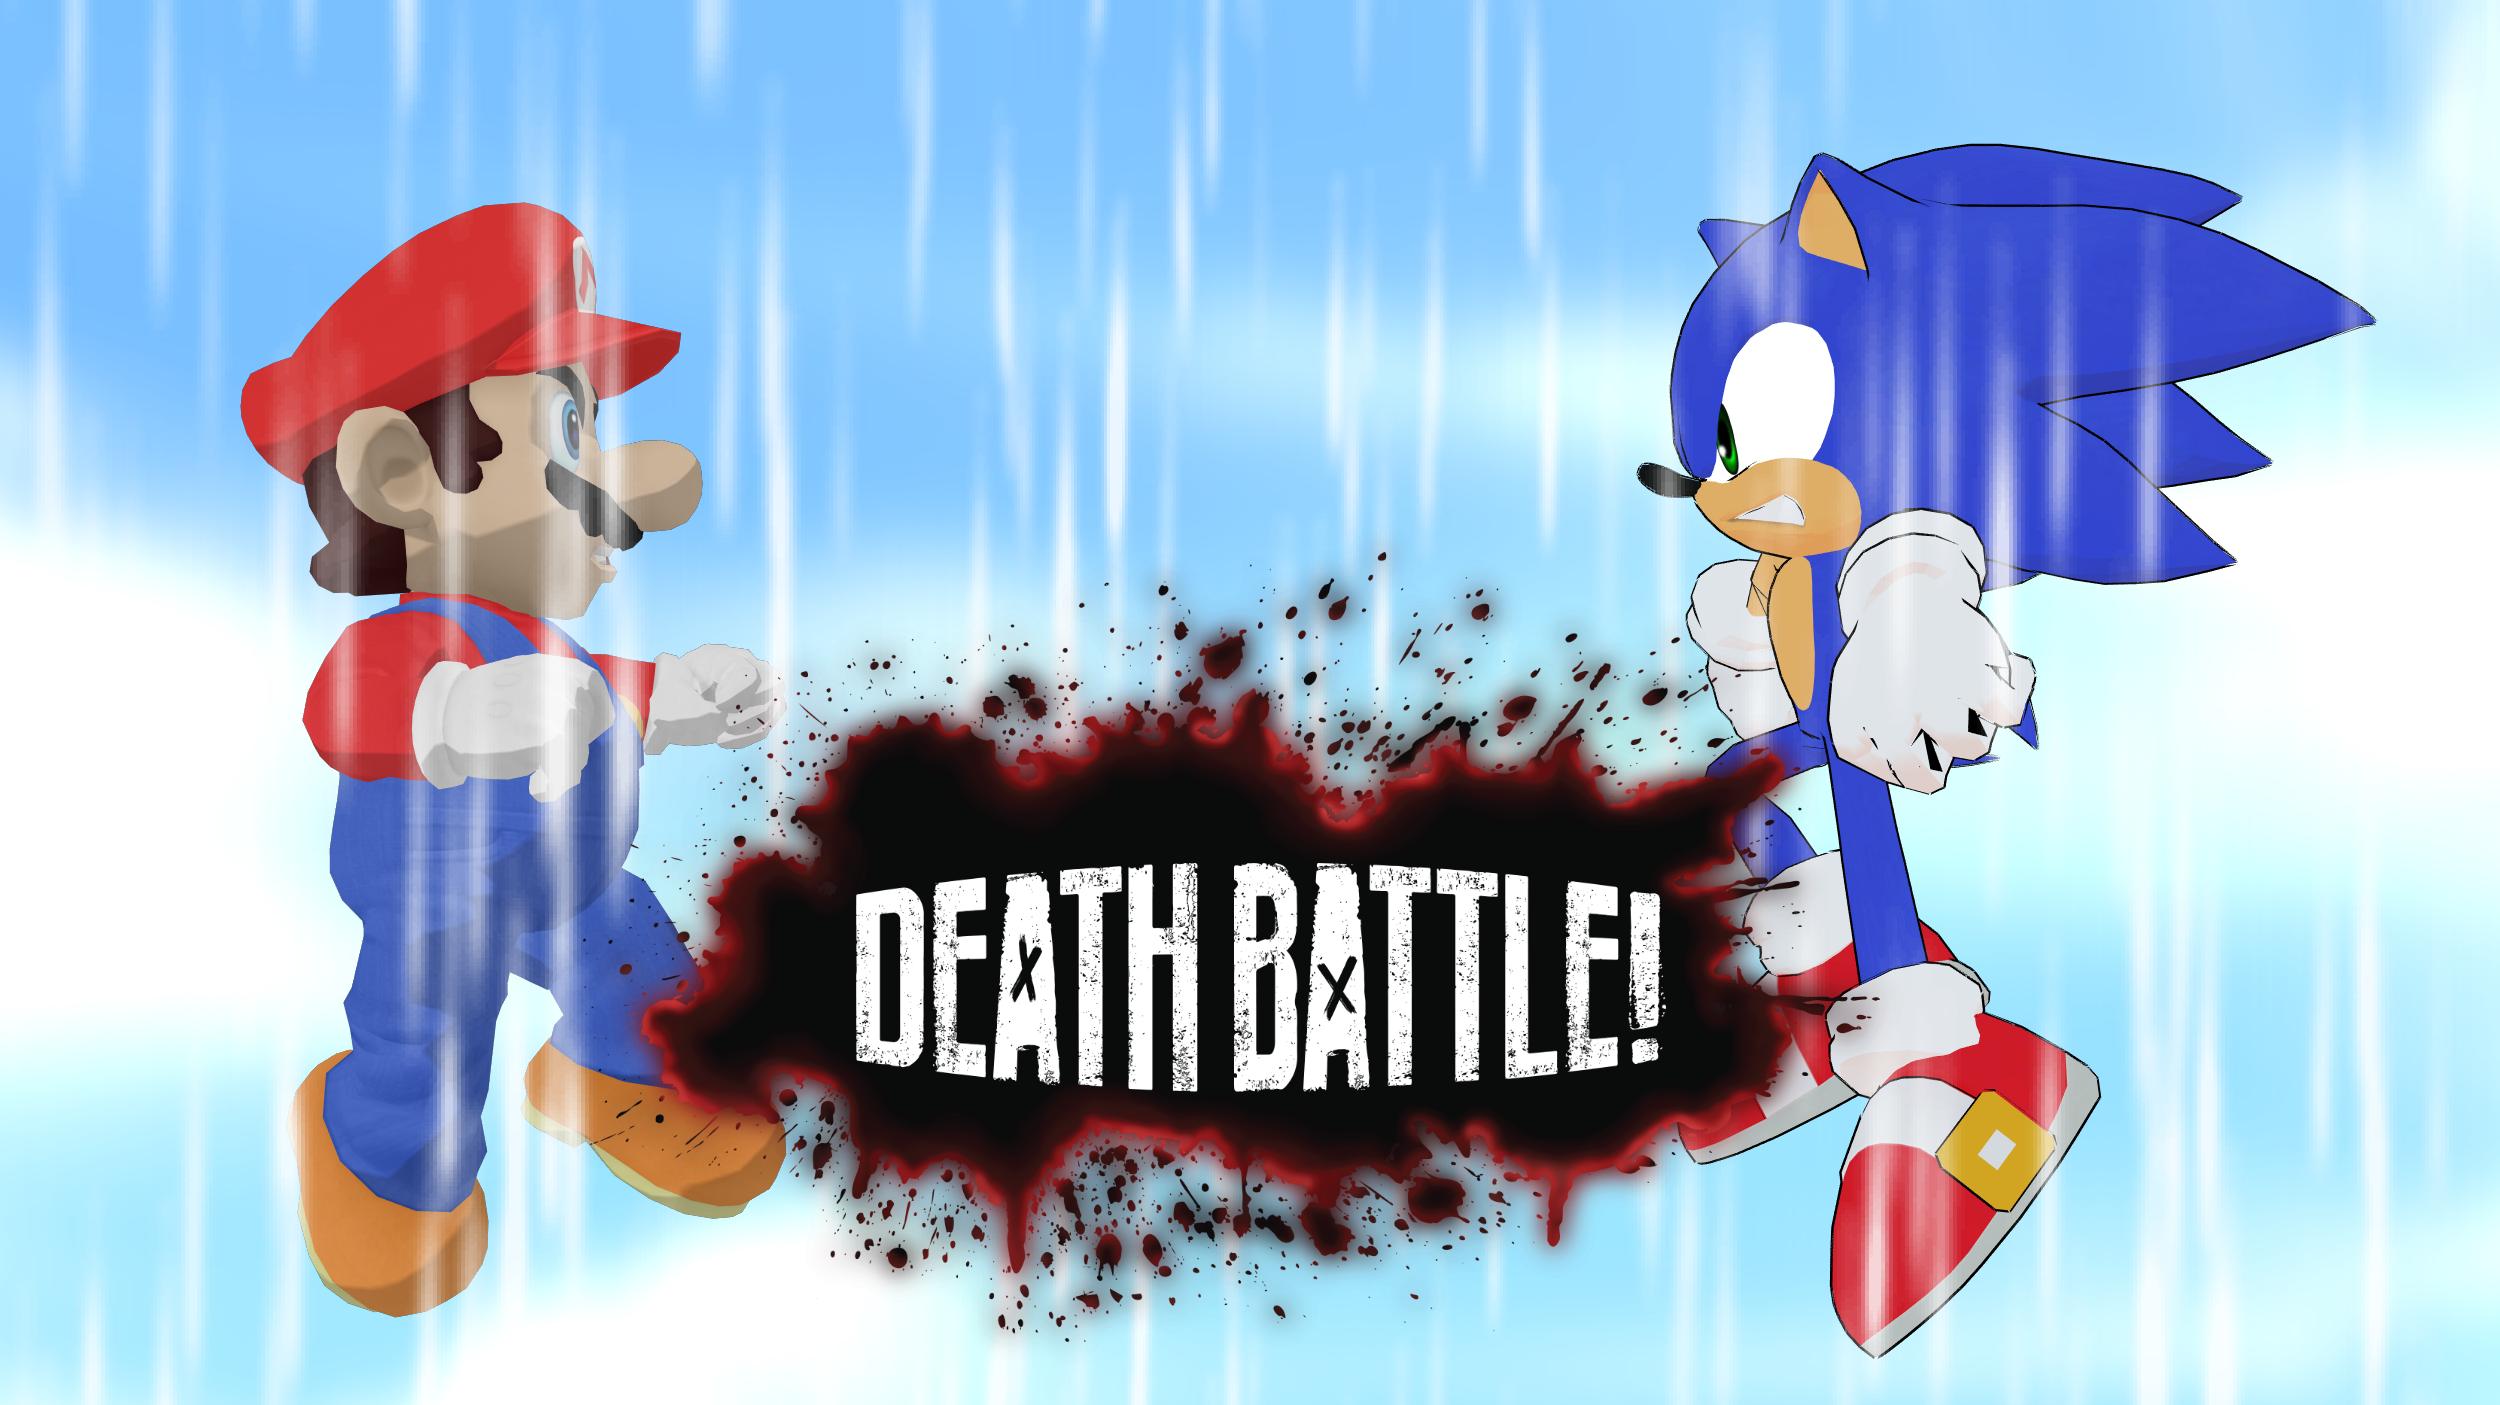 Death Battle Mario Vs Sonic 2018 Wallpaper By Mattplaysvg On Deviantart